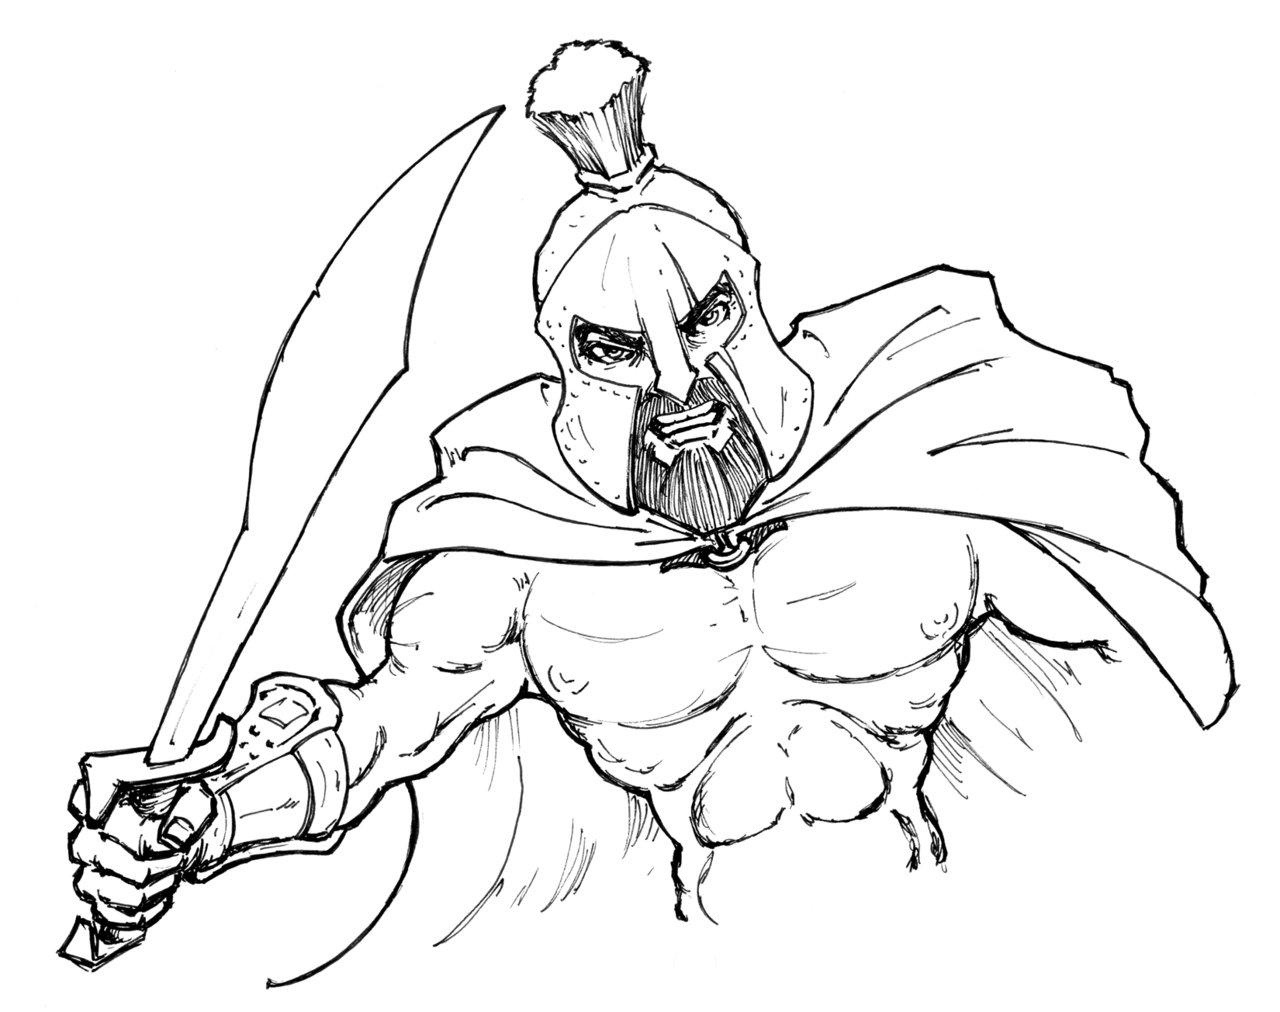 1280x1012 Spartan Inked By Johnrose Illustrator